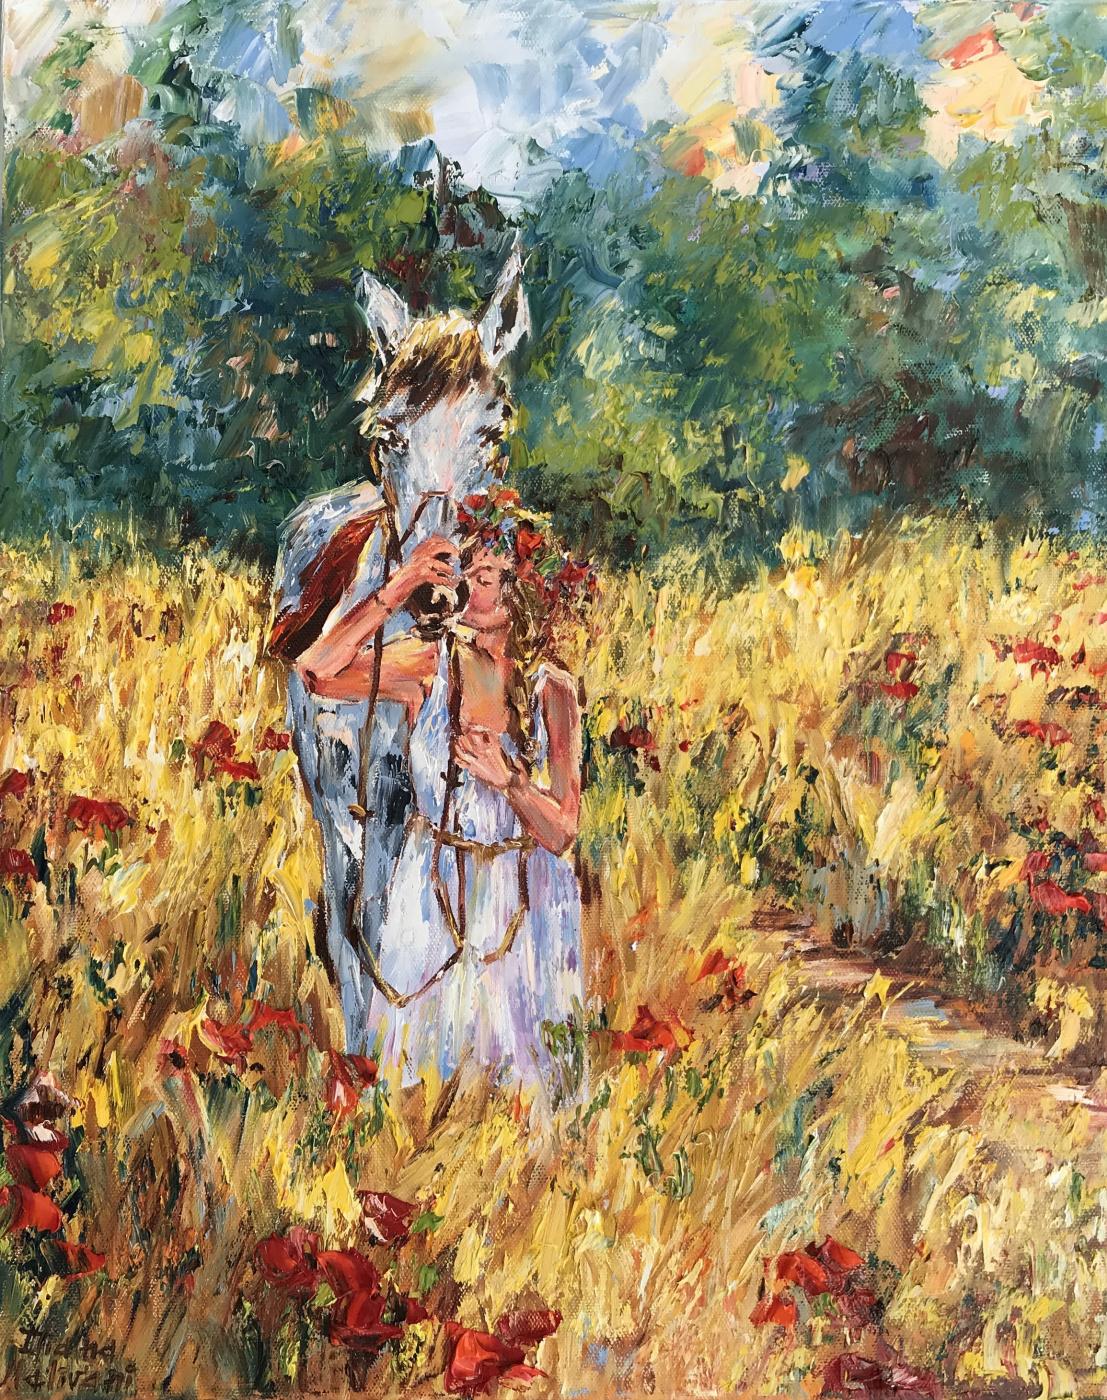 Диана Владимировна Маливани. Poppies at Sunset